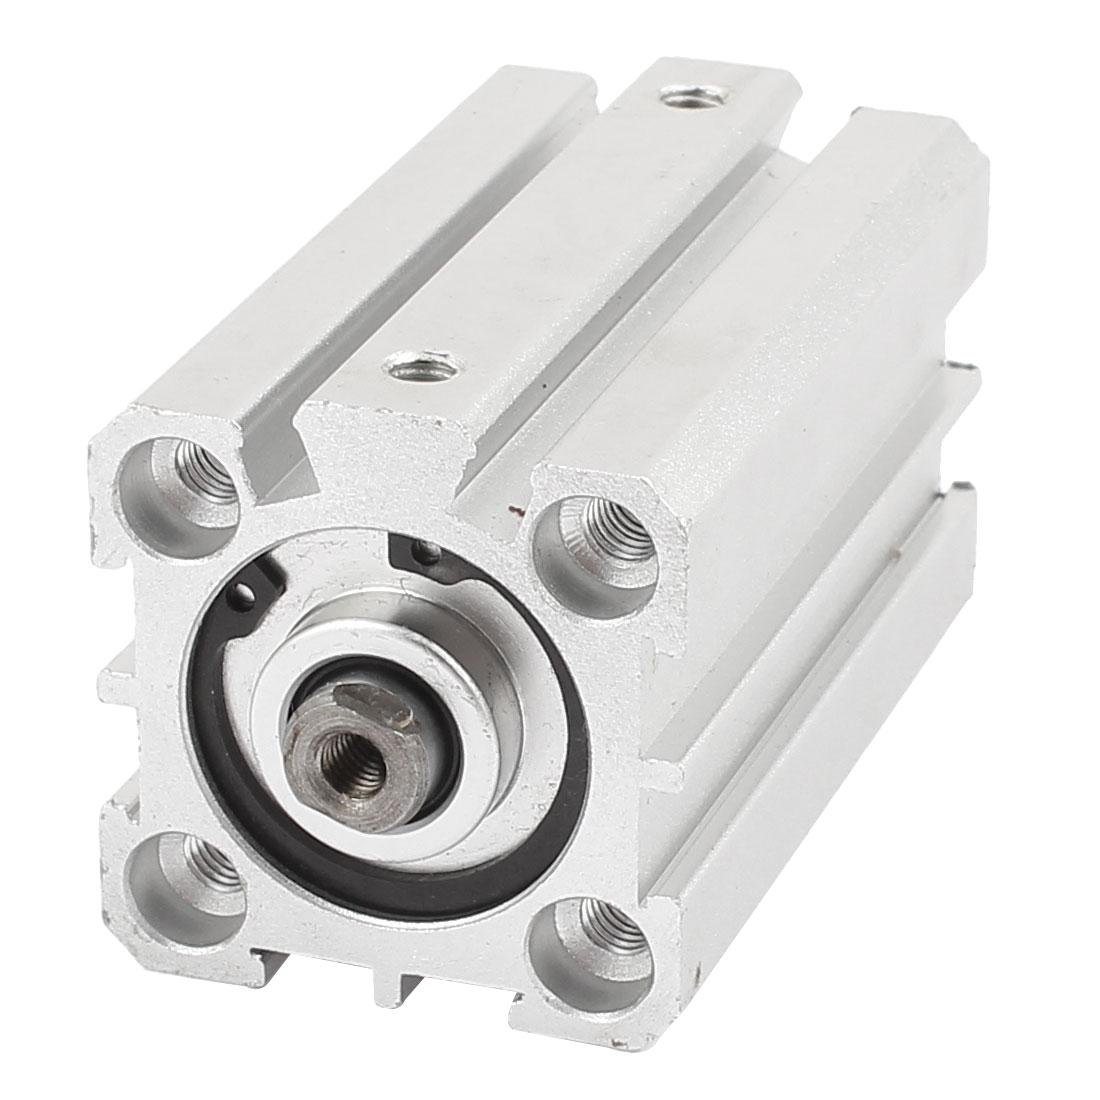 KSDA25x50 50mm Stroke 25mm Bore Aluminium Pneumatic Compact Air Cylinder